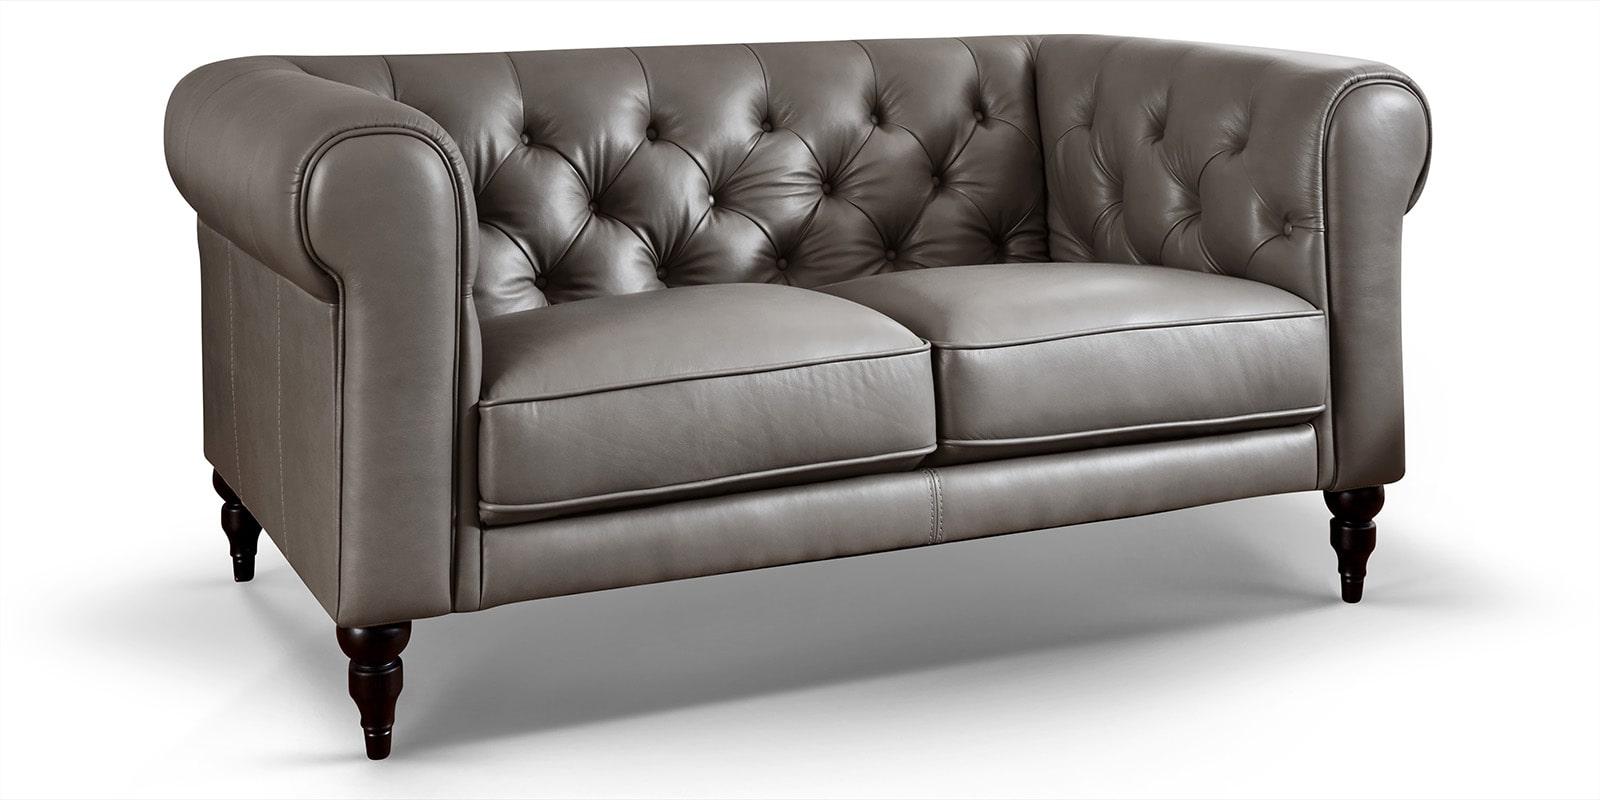 2 Sitzer Chesterfield Sofa Aus Echtem Leder Hudson Grau Moebella24